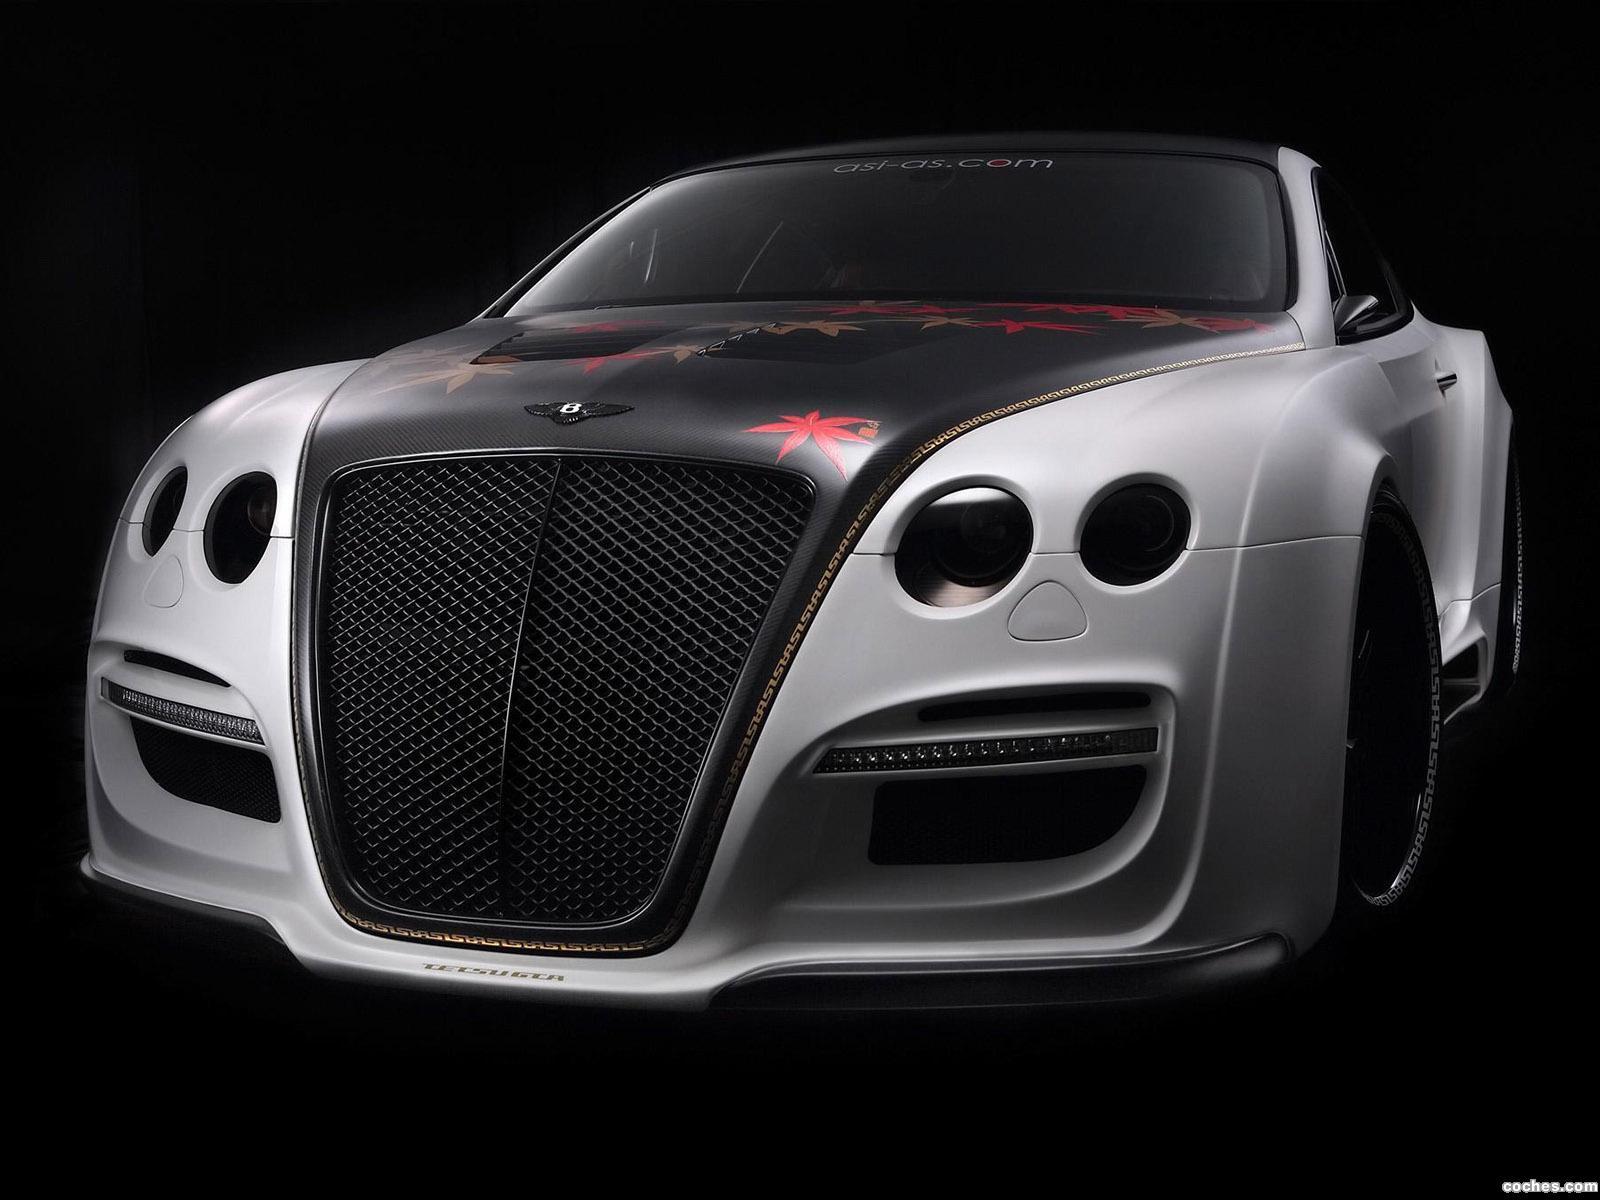 Foto 0 de ASI Bentley Continental GT Tetsu GTR 2009